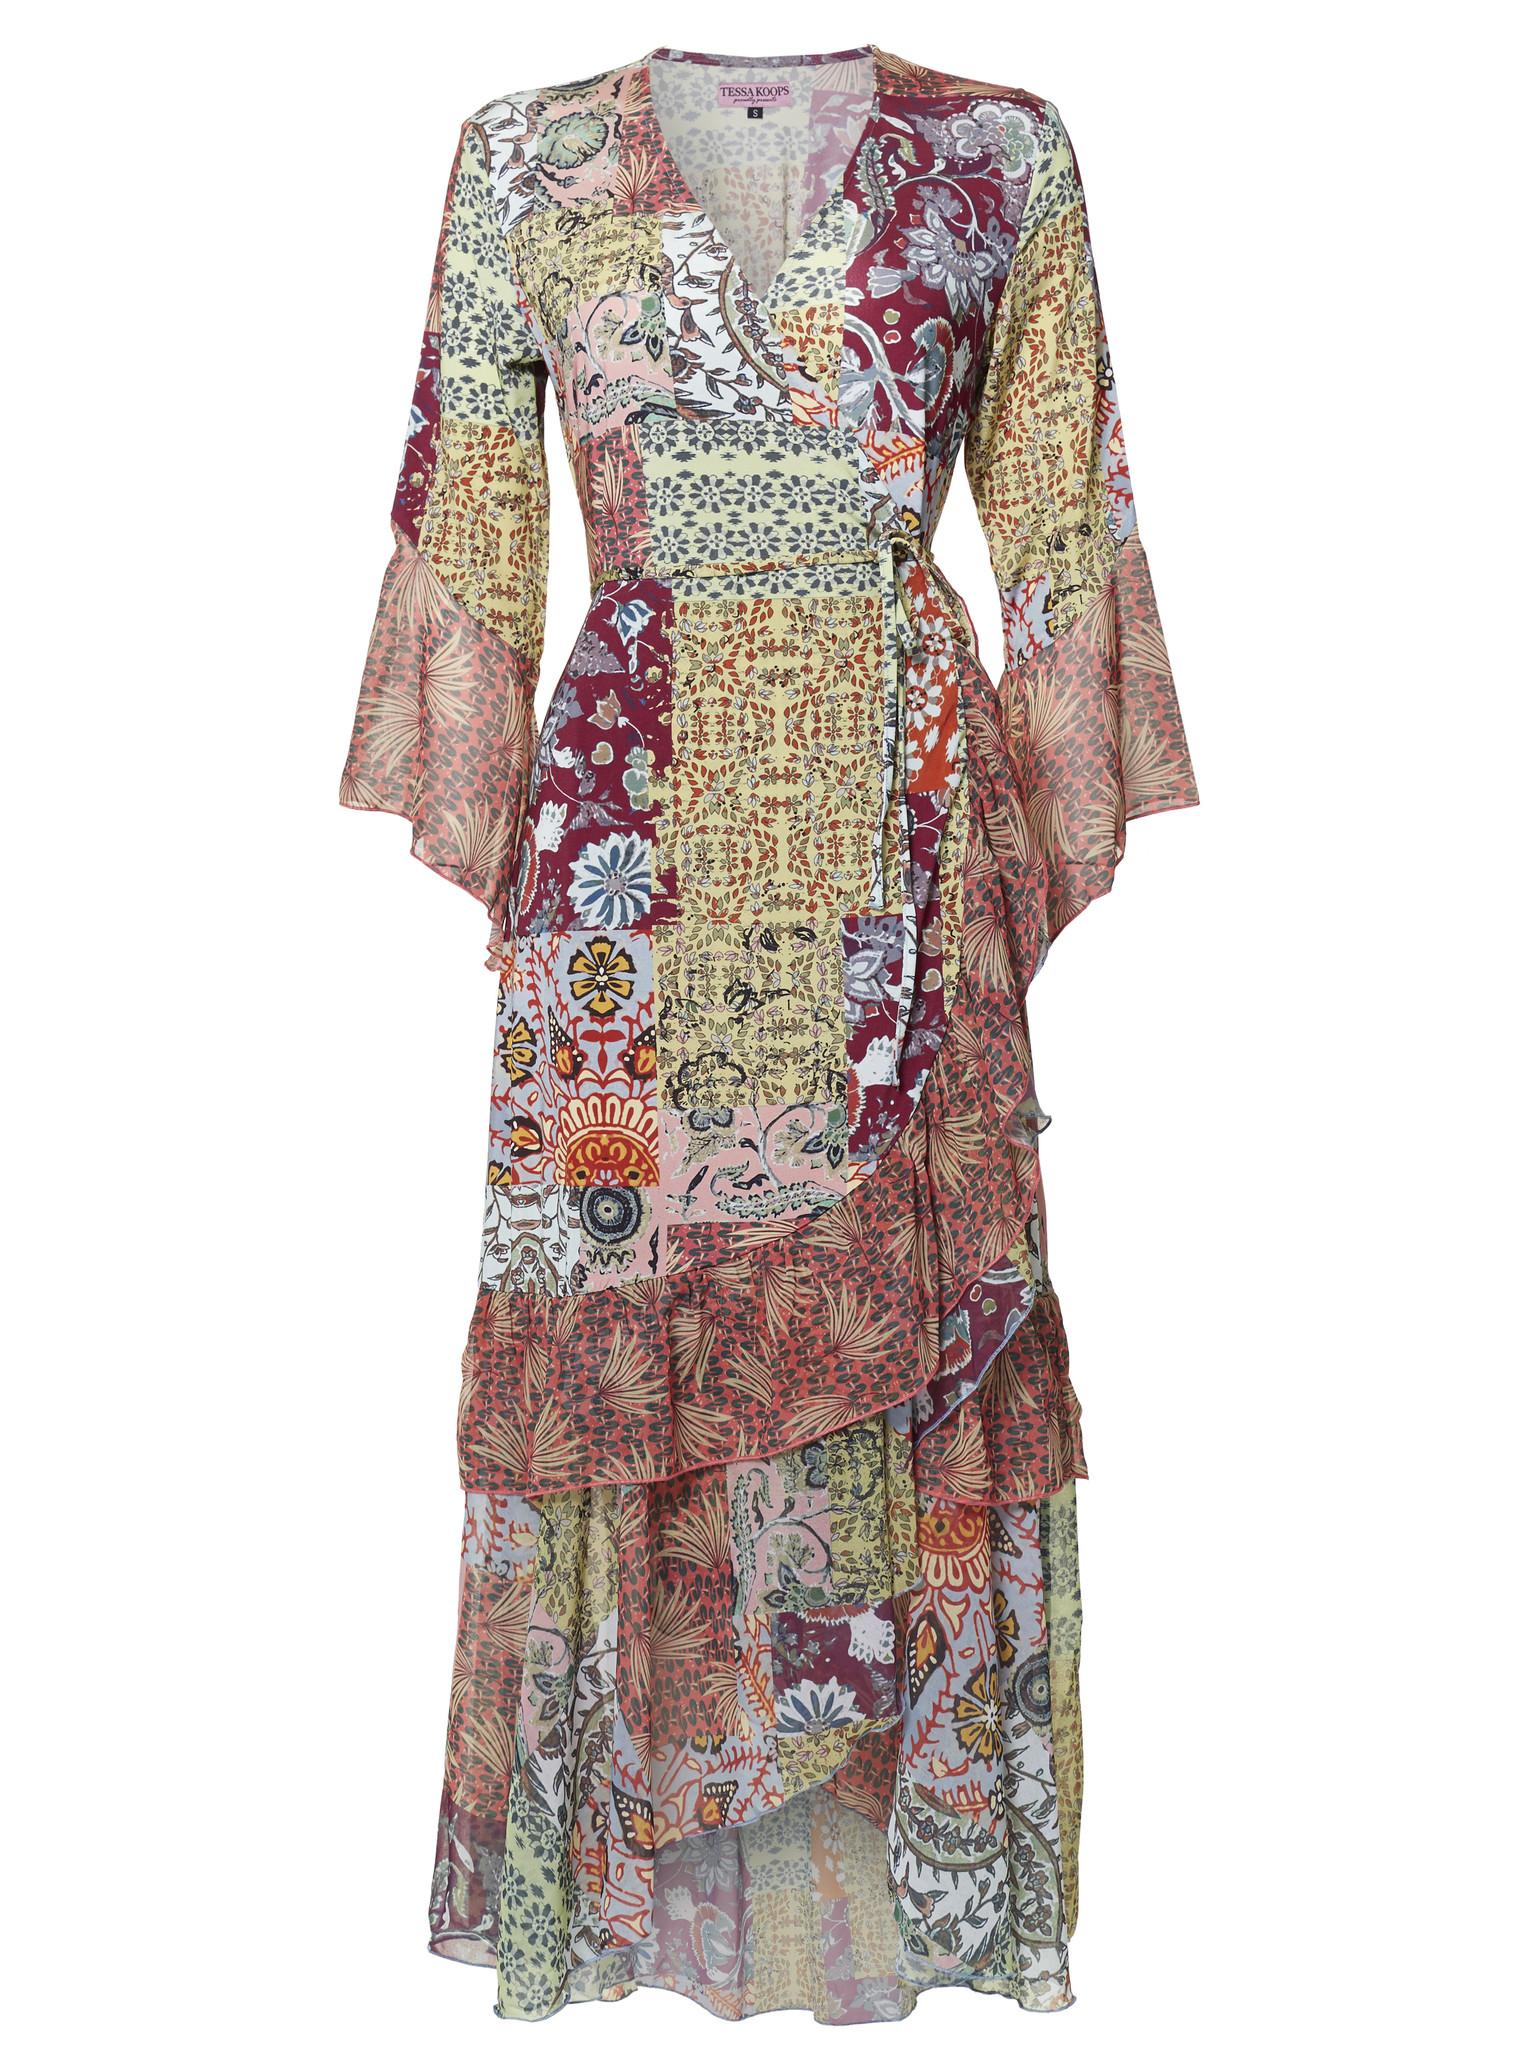 TESSA KOOPS INDIRA NADOR DRESS